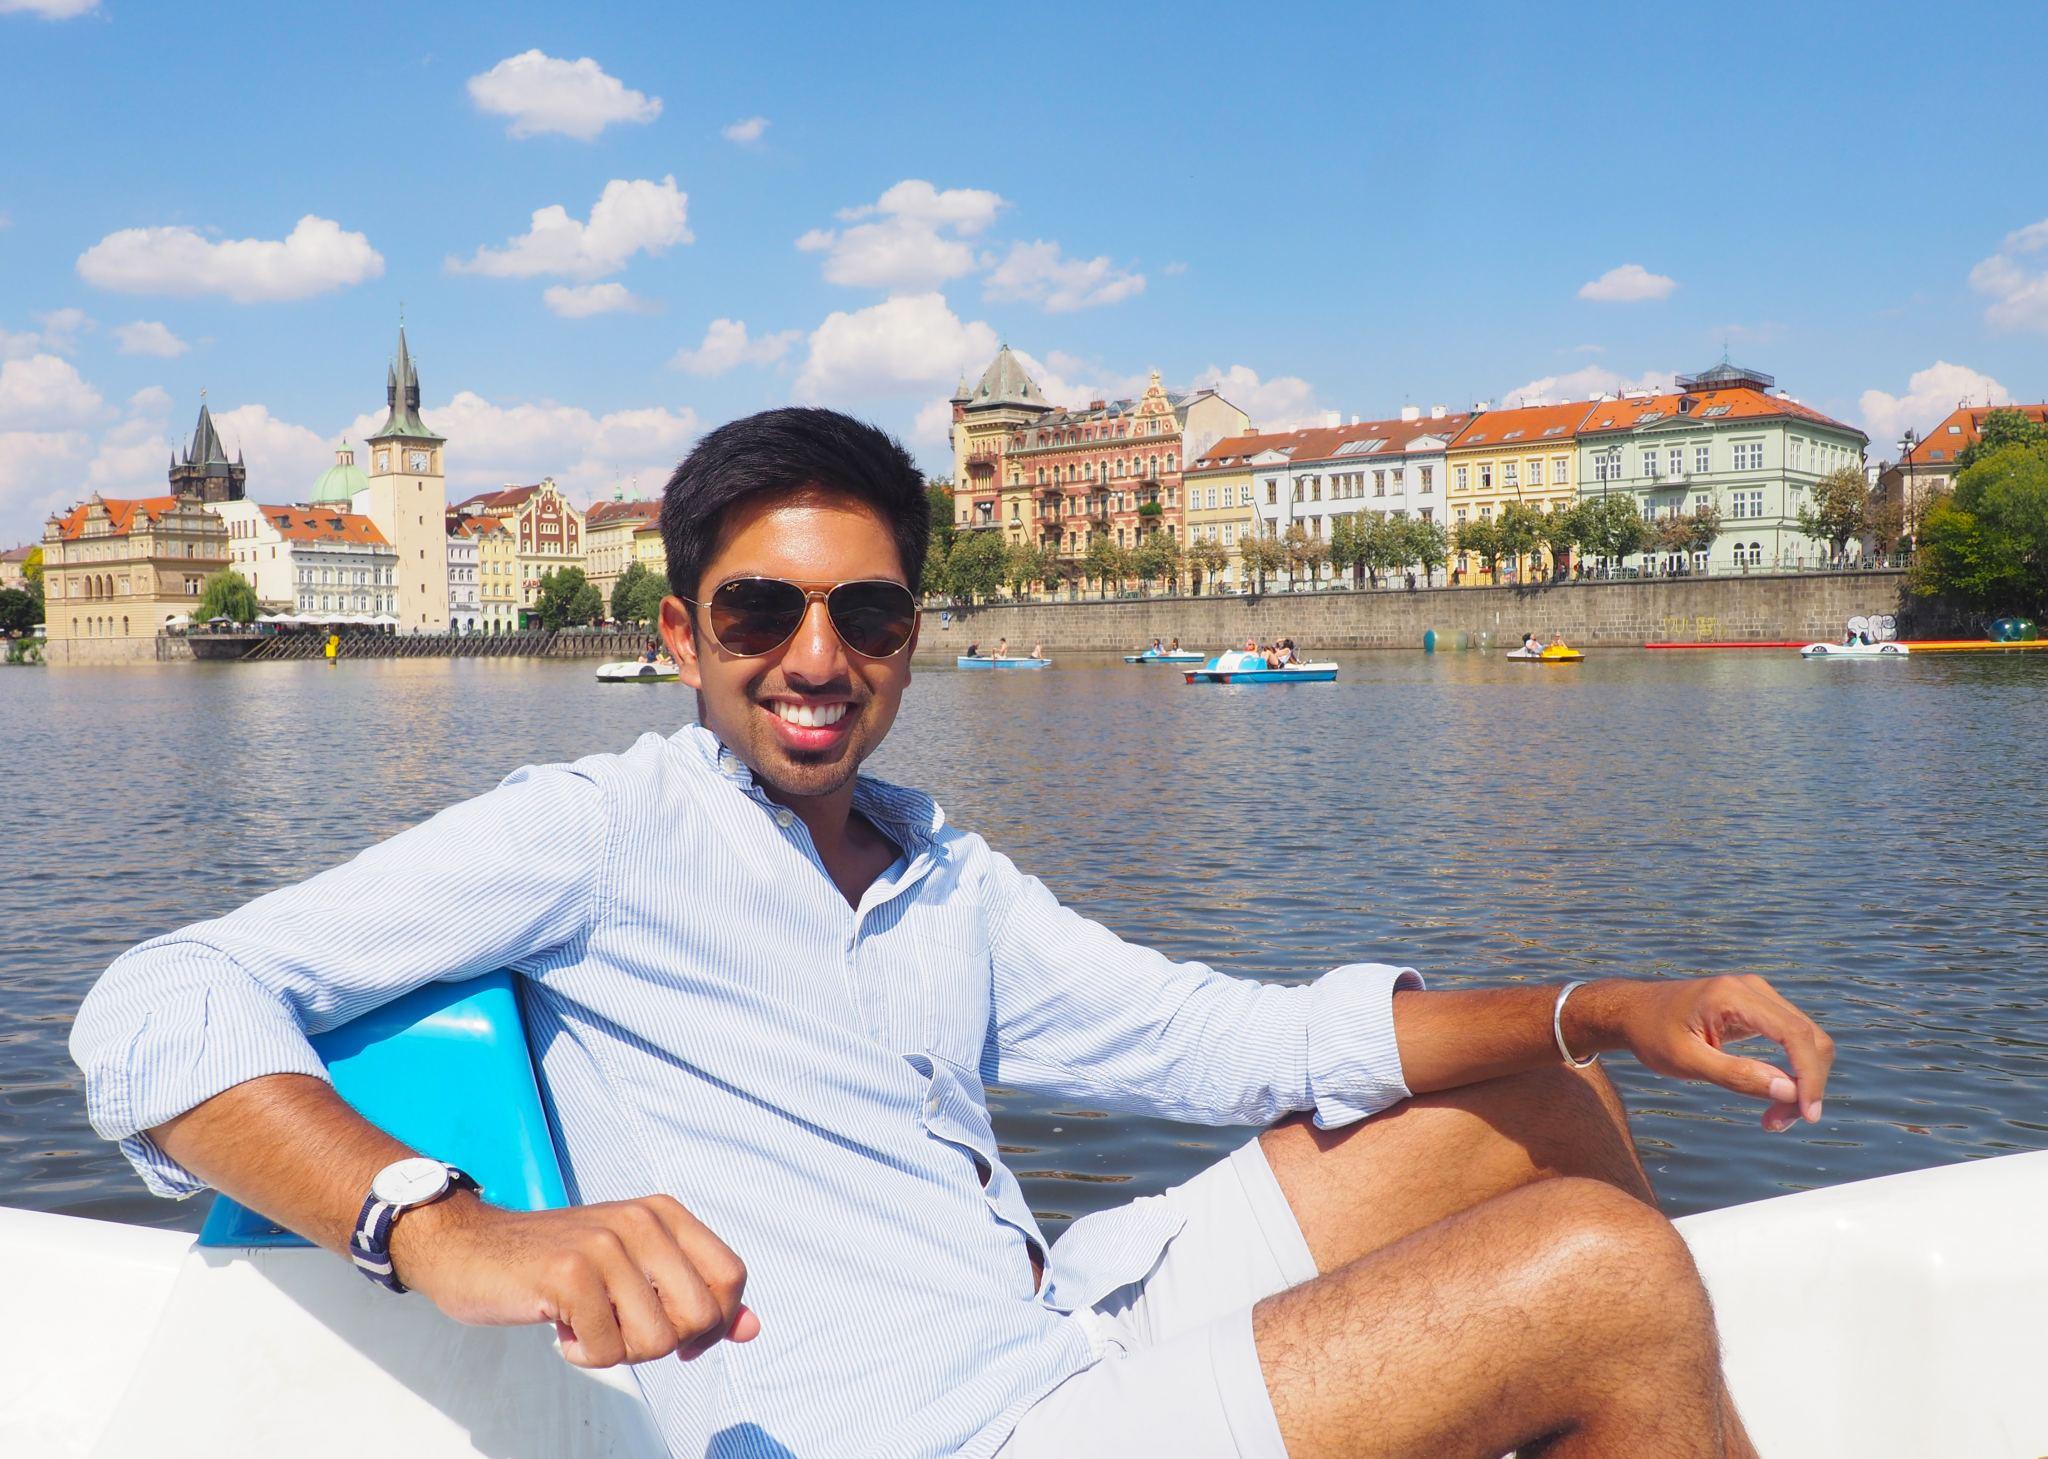 Peddle Boat Prague